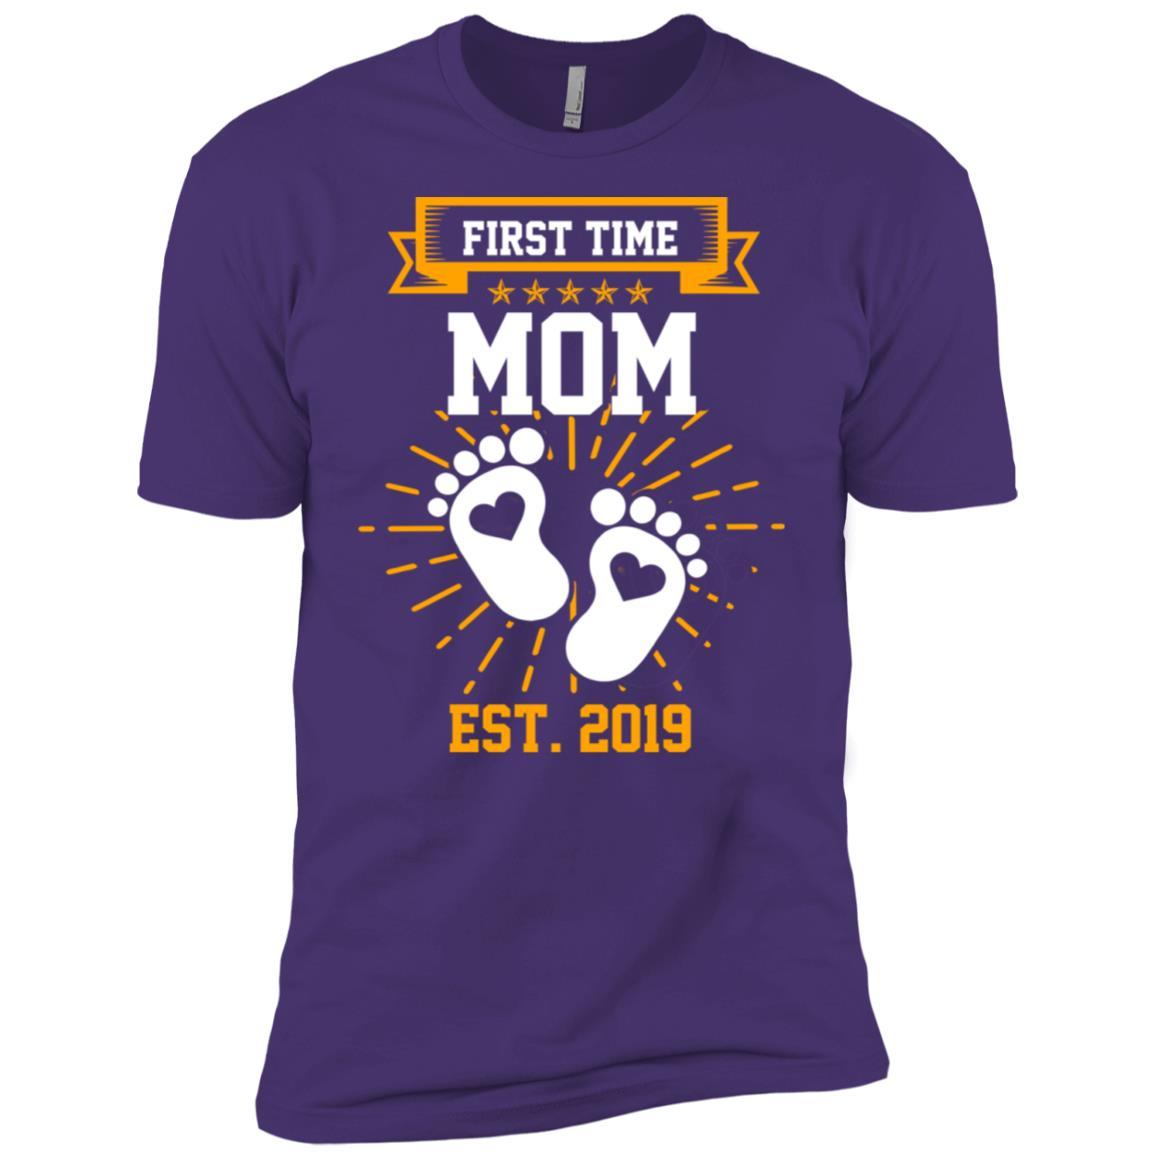 First Time Mom Est 2019 Gift Men Short Sleeve T-Shirt